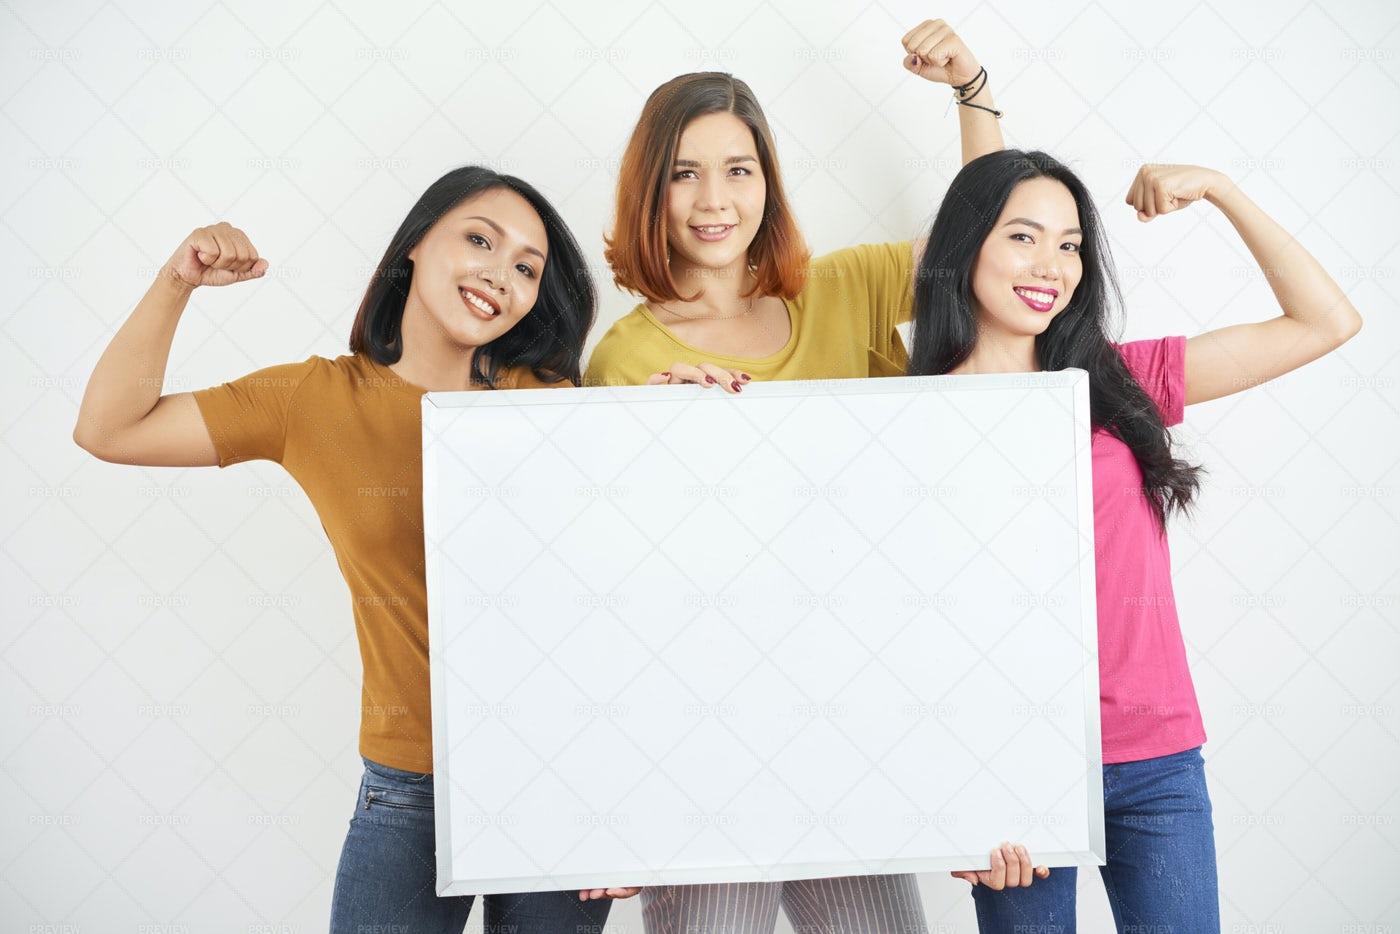 Women Showing Their Girl Power: Stock Photos